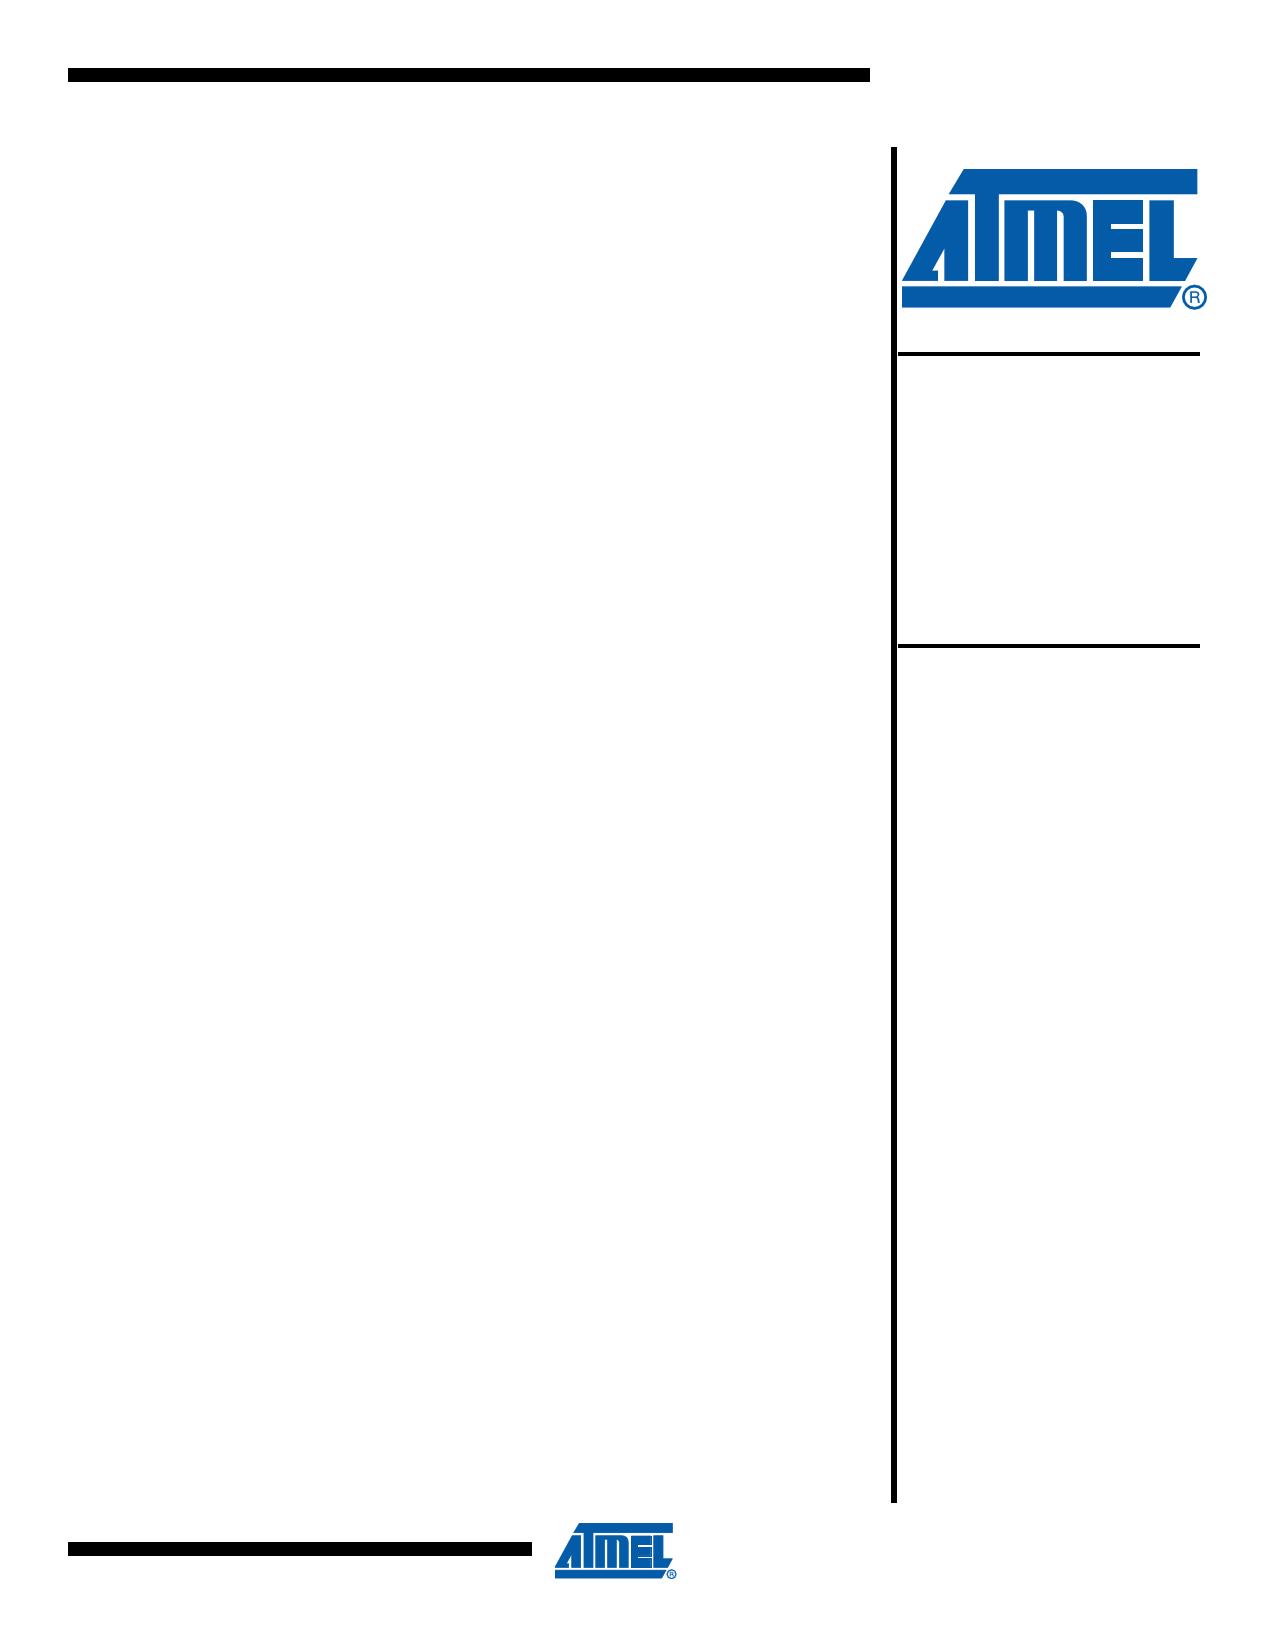 AT89LP51RD2 데이터시트 및 AT89LP51RD2 PDF